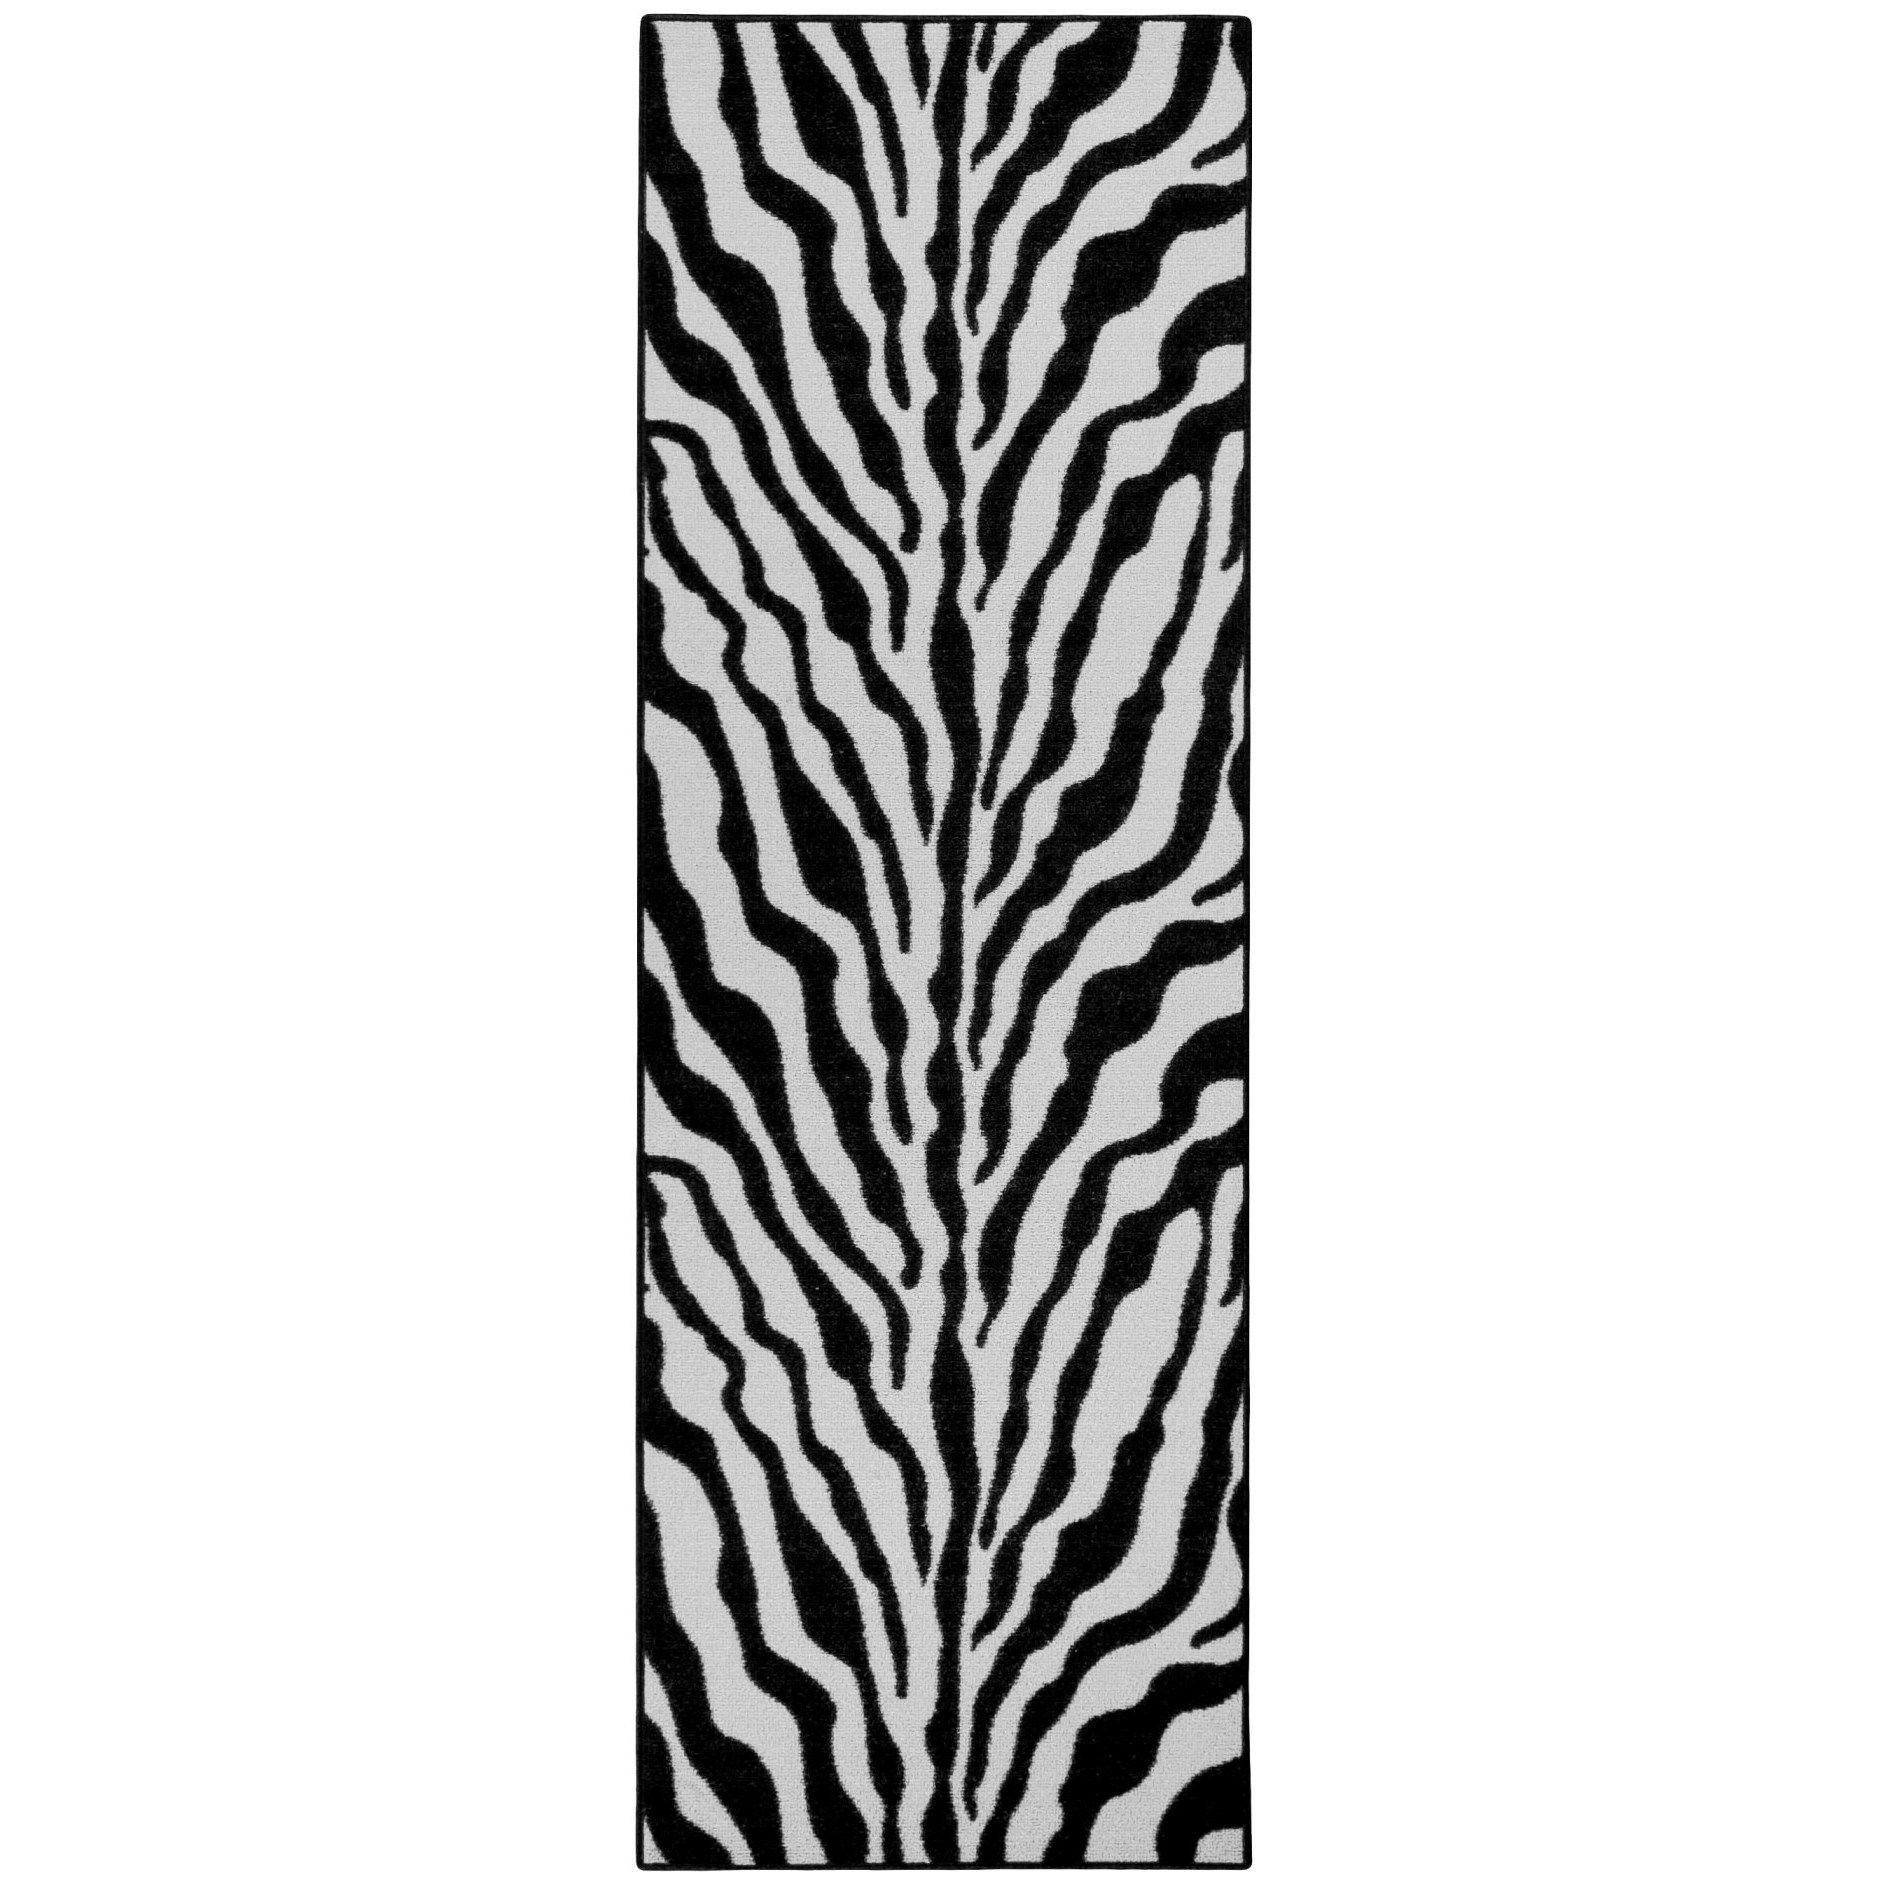 Rubber Back Black And Snow White Zebra Print Non-Slip Long